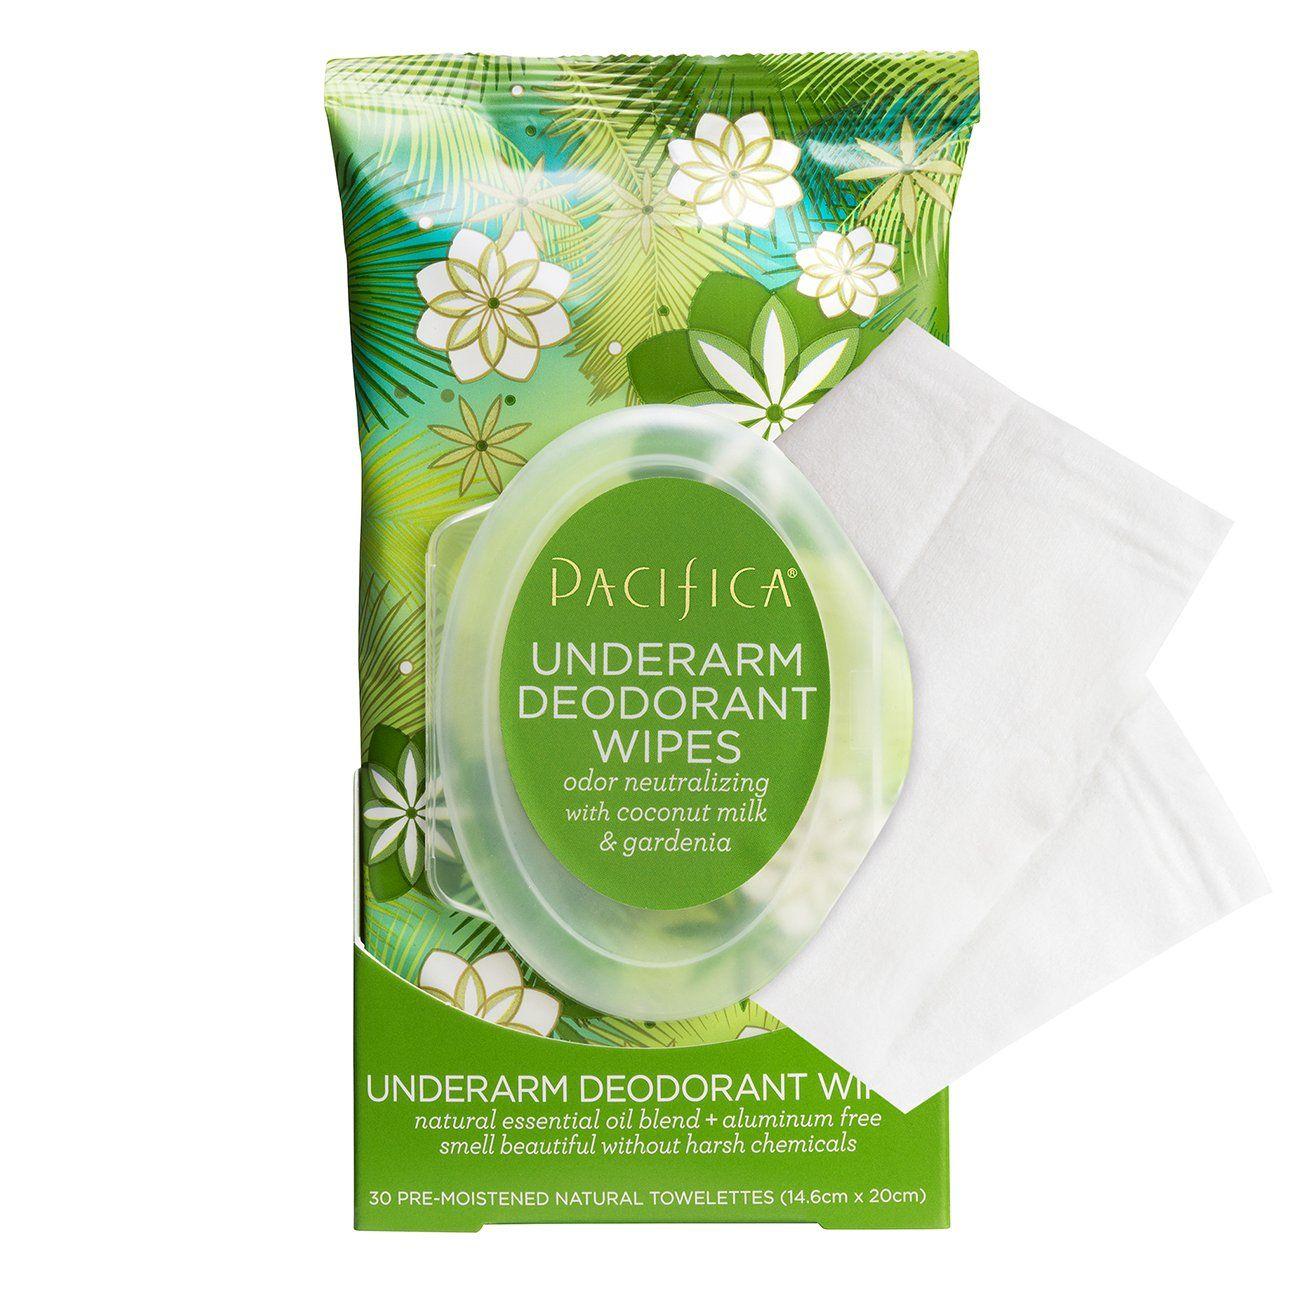 Coconut Gardenia Underarm Deodorant Wipes Pacifica Underarm